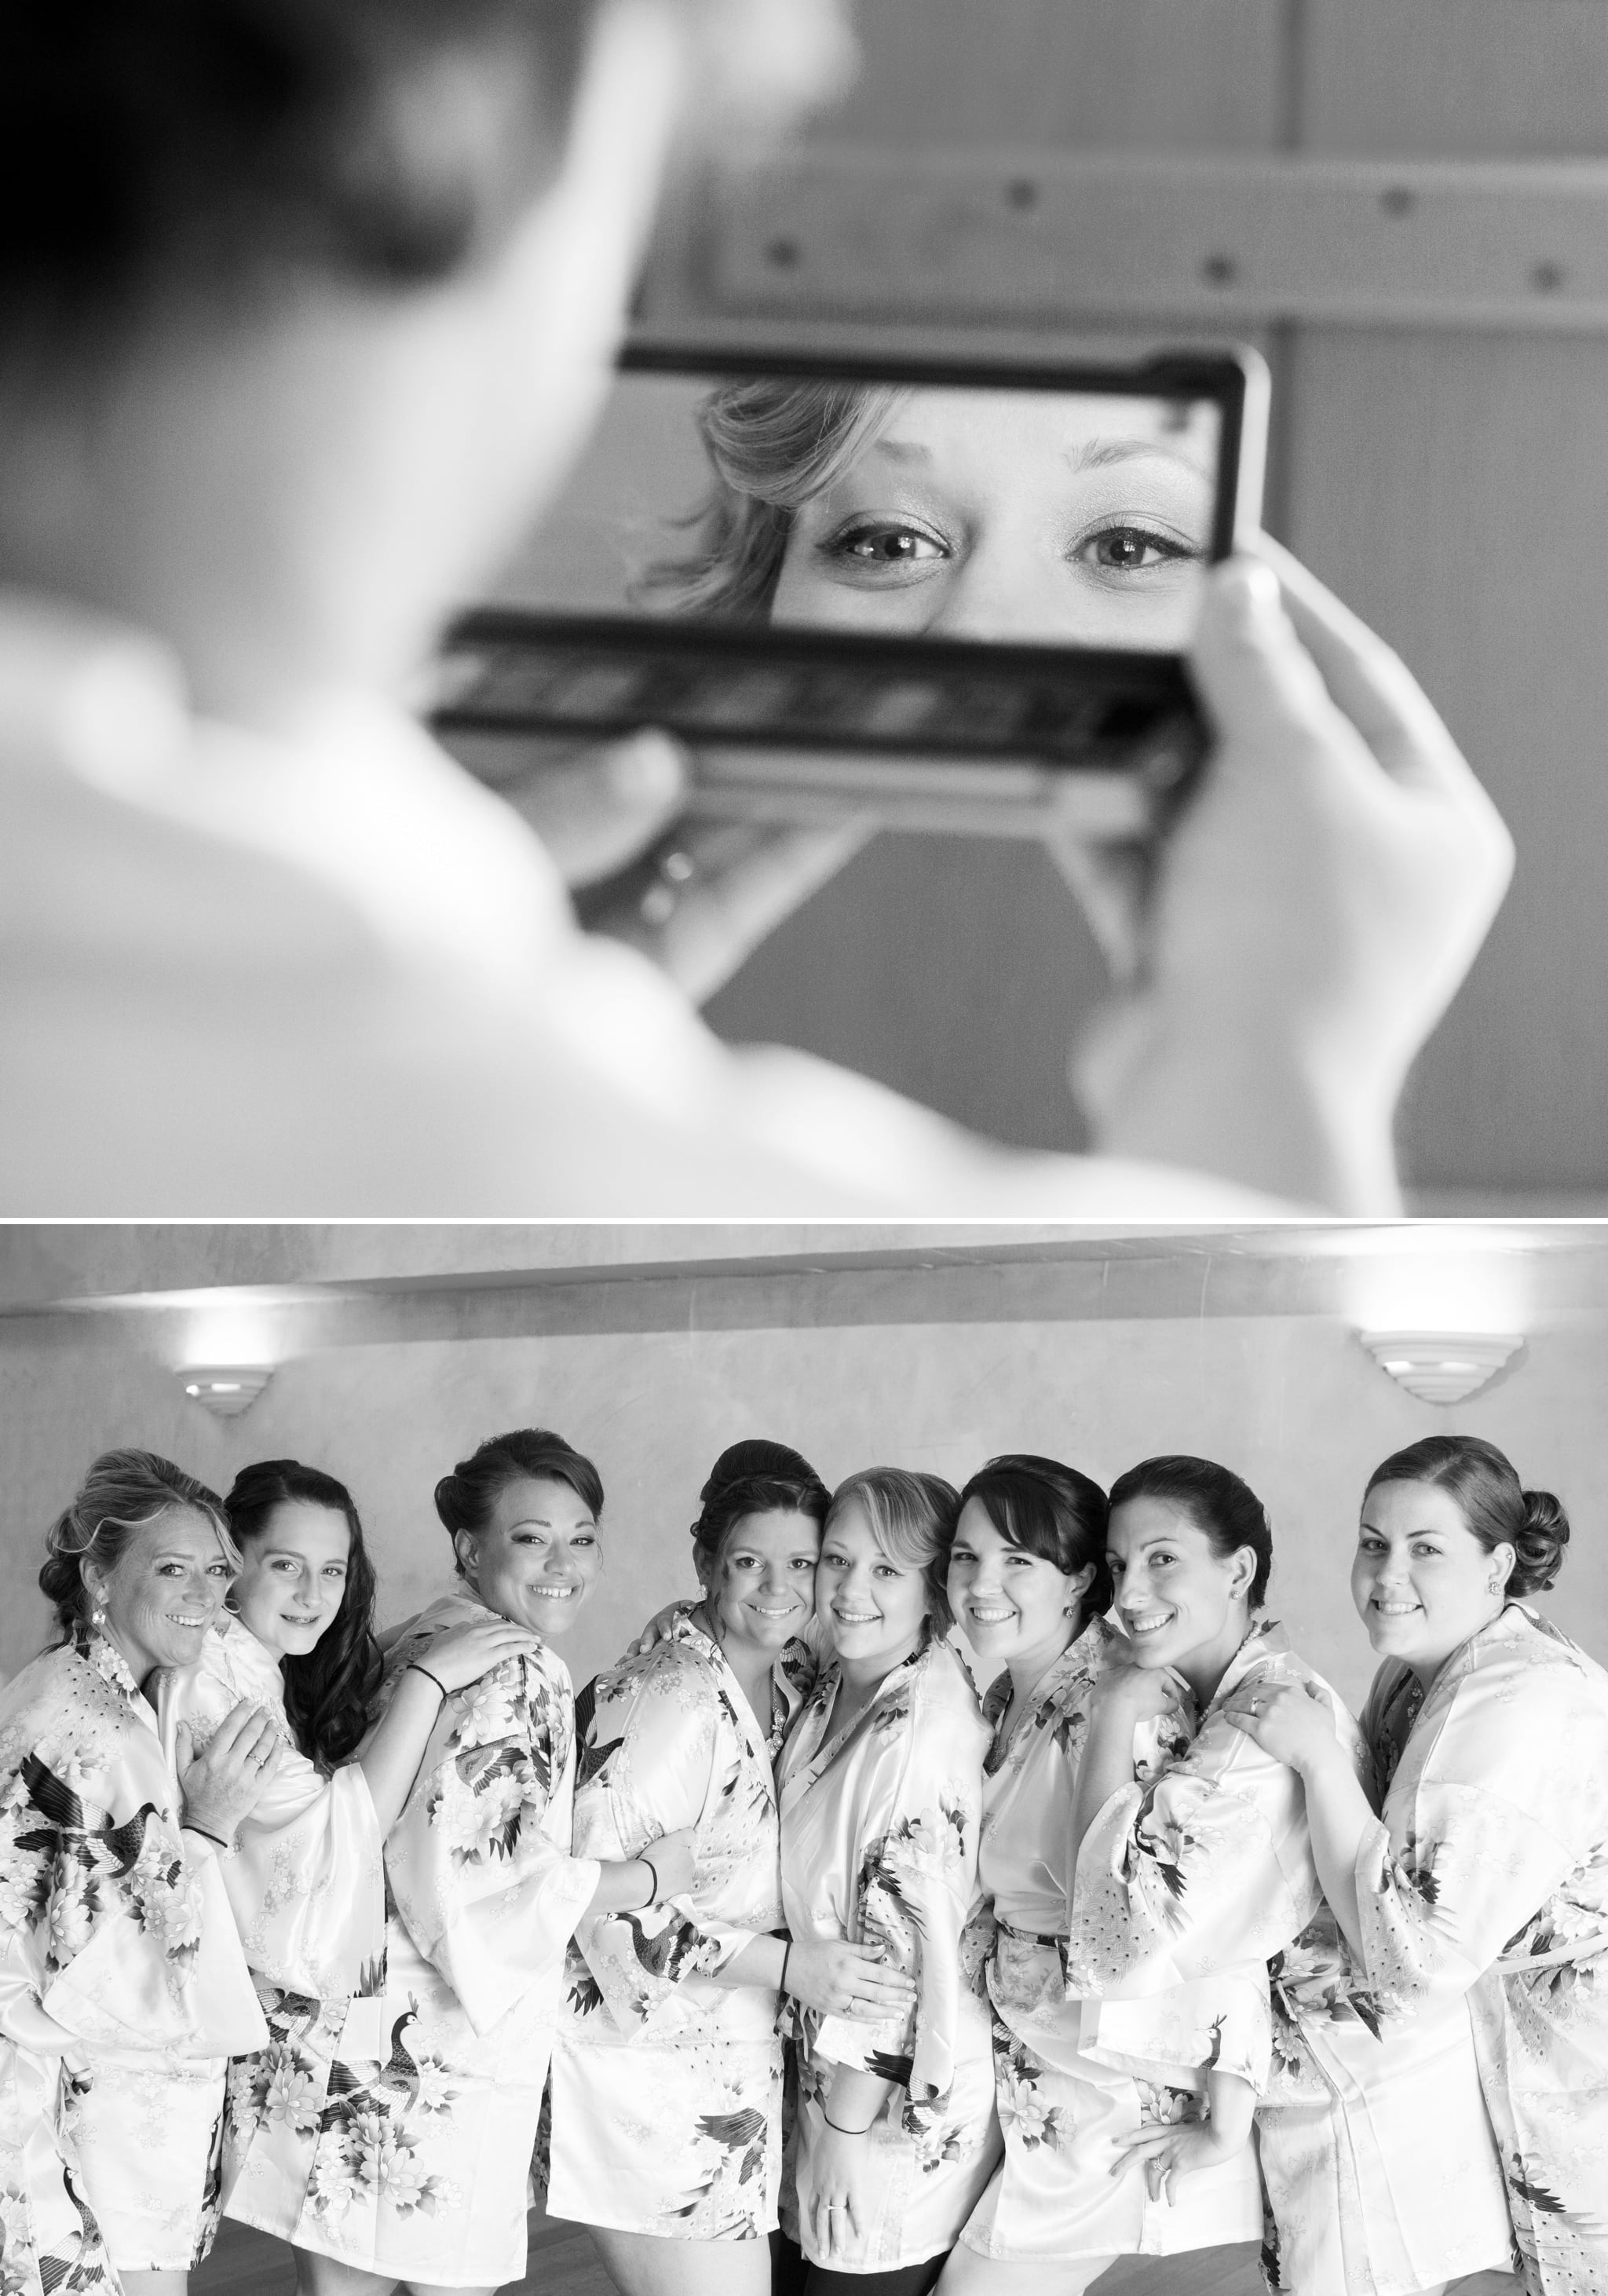 TheRedLionInnWeddingPhotography_RusticVintageFallWedding_MichelleGirardPhotography01.jpg